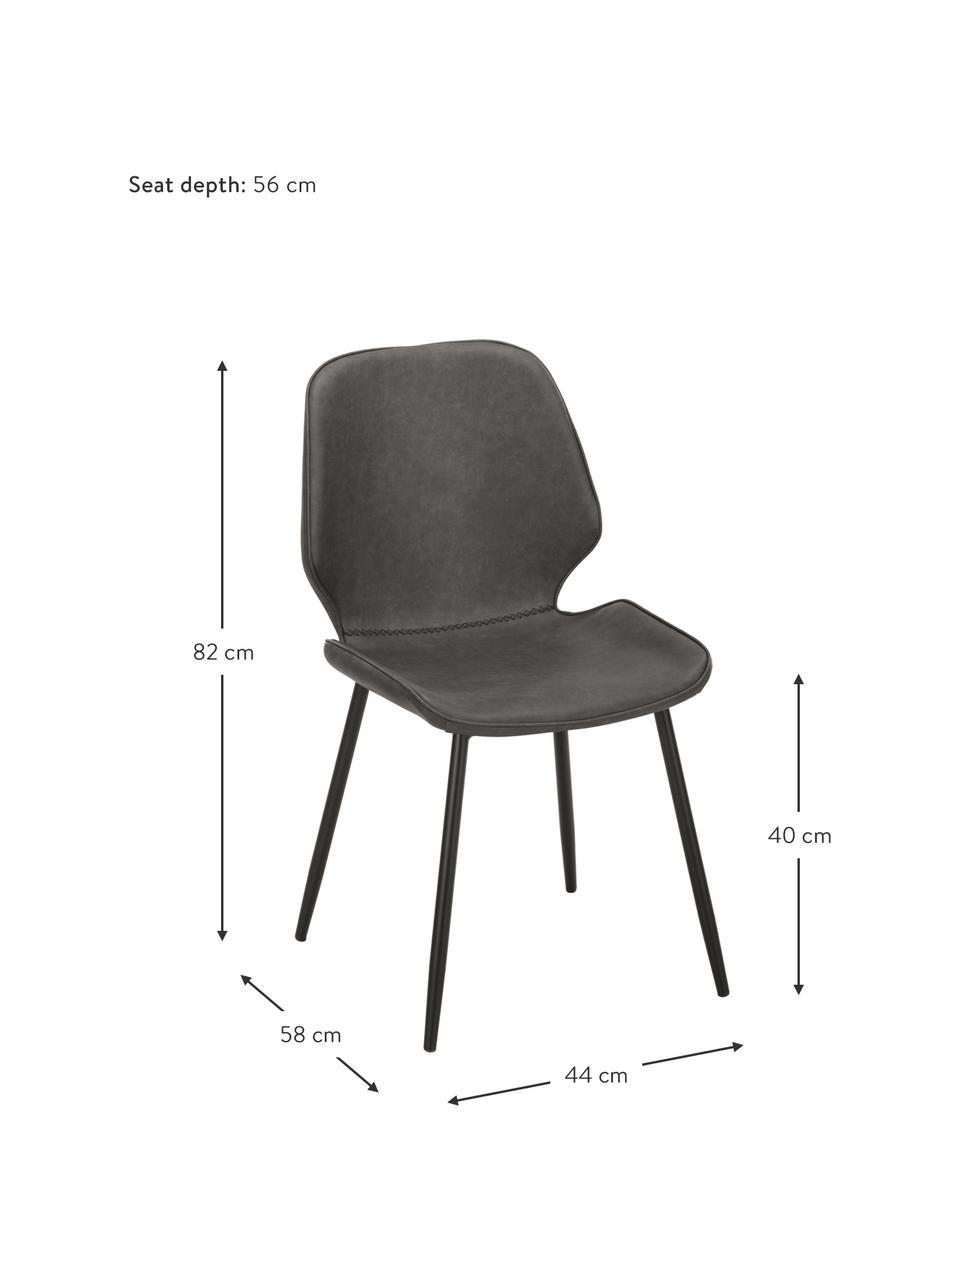 Kunstleder-Polsterstühle Louis, 2 Stück, Bezug: Kunstleder (65% Polyethyl, Beine: Metall, pulverbeschichtet, Kunstleder Dunkelgrau, B 44 x T 58 cm